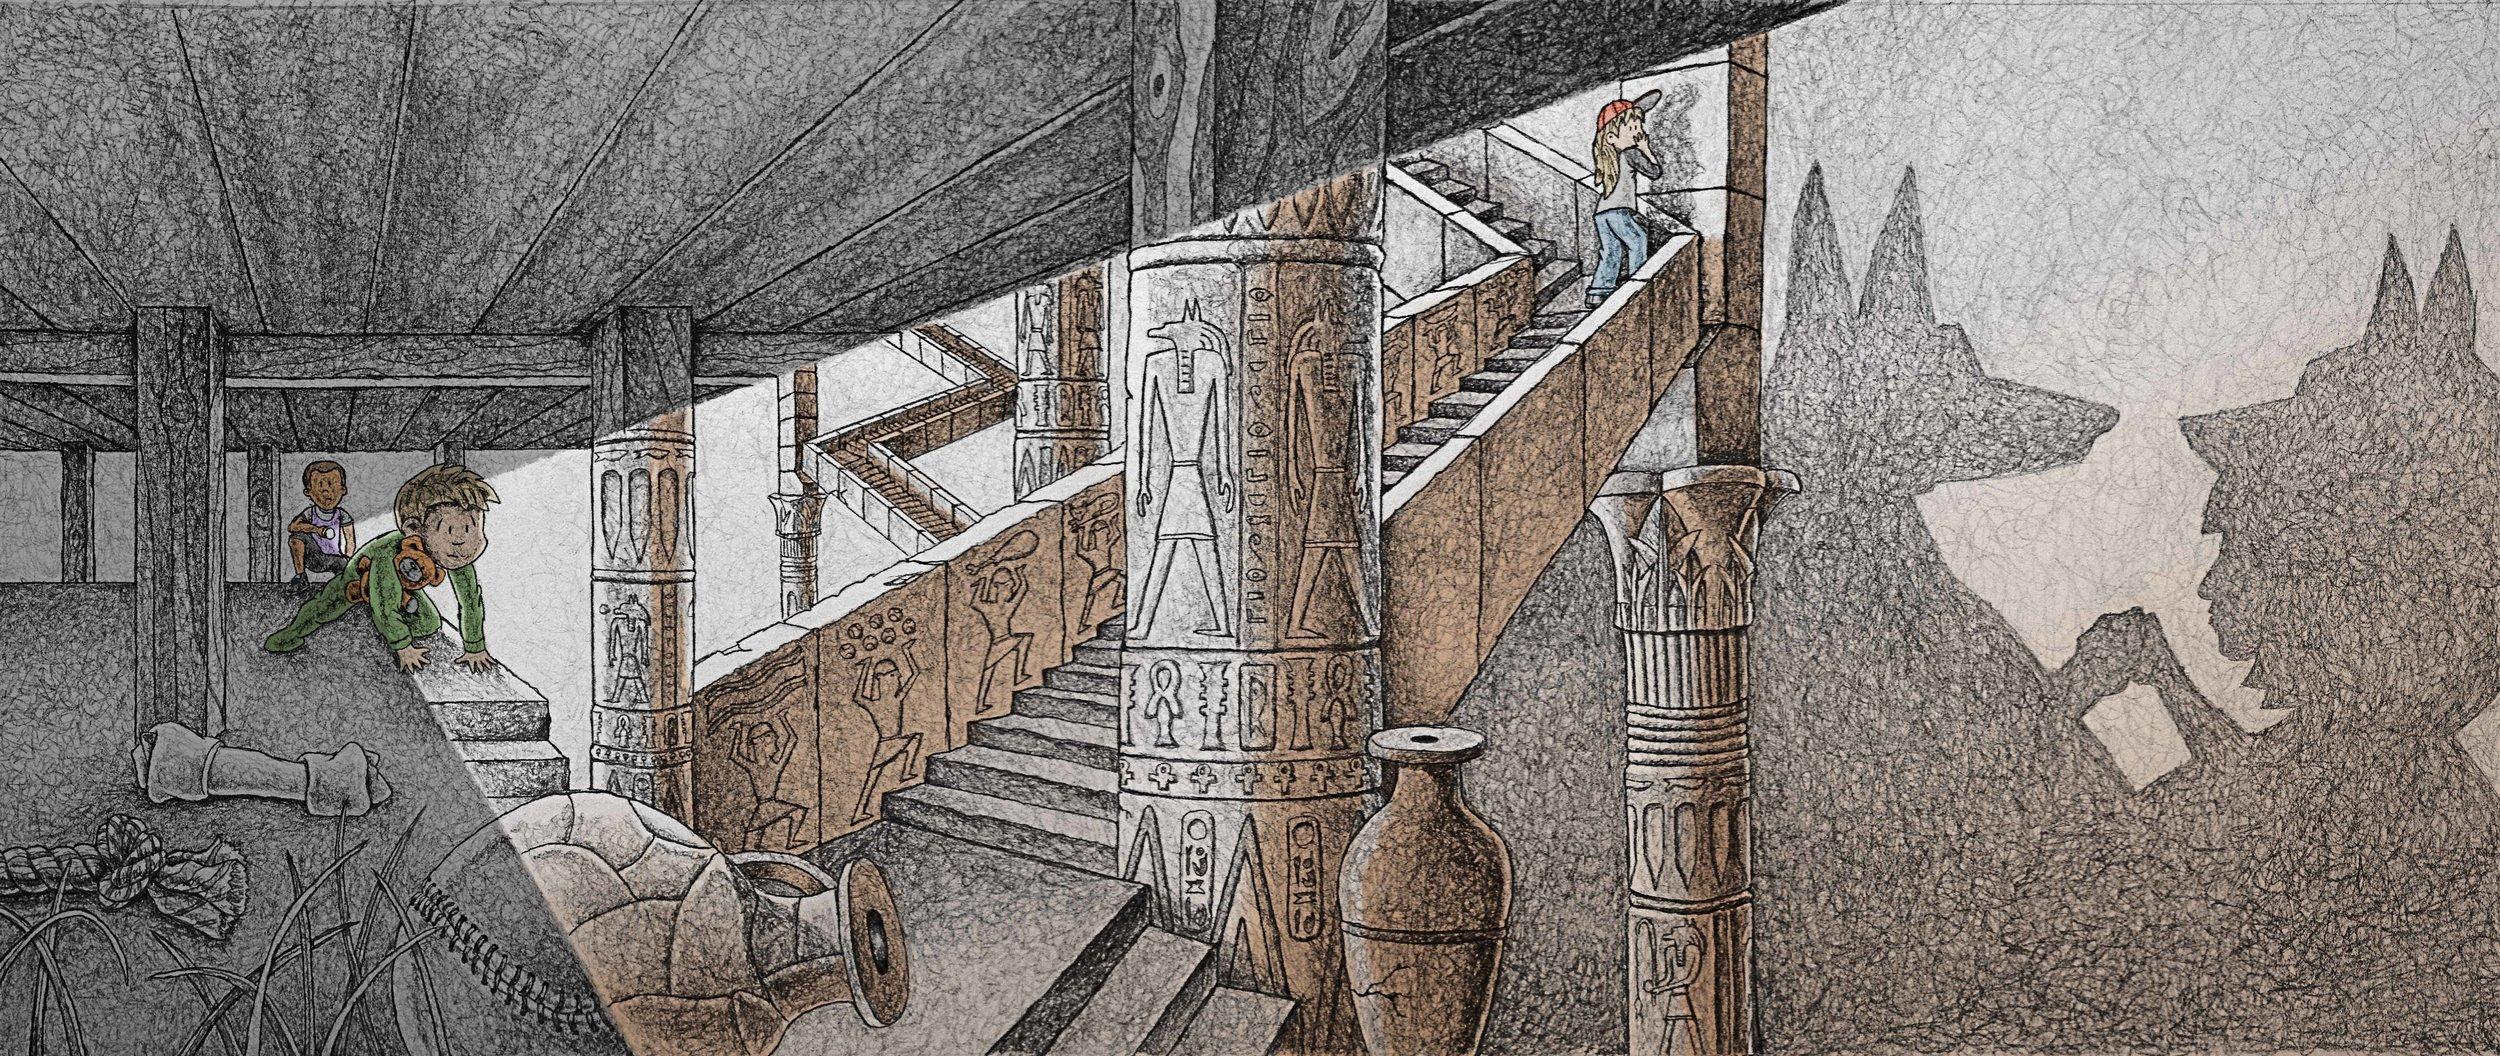 Fred Koehler 'Flashlight Night,' 2017, Pencil, digital coloring, Image courtesy of the artist.